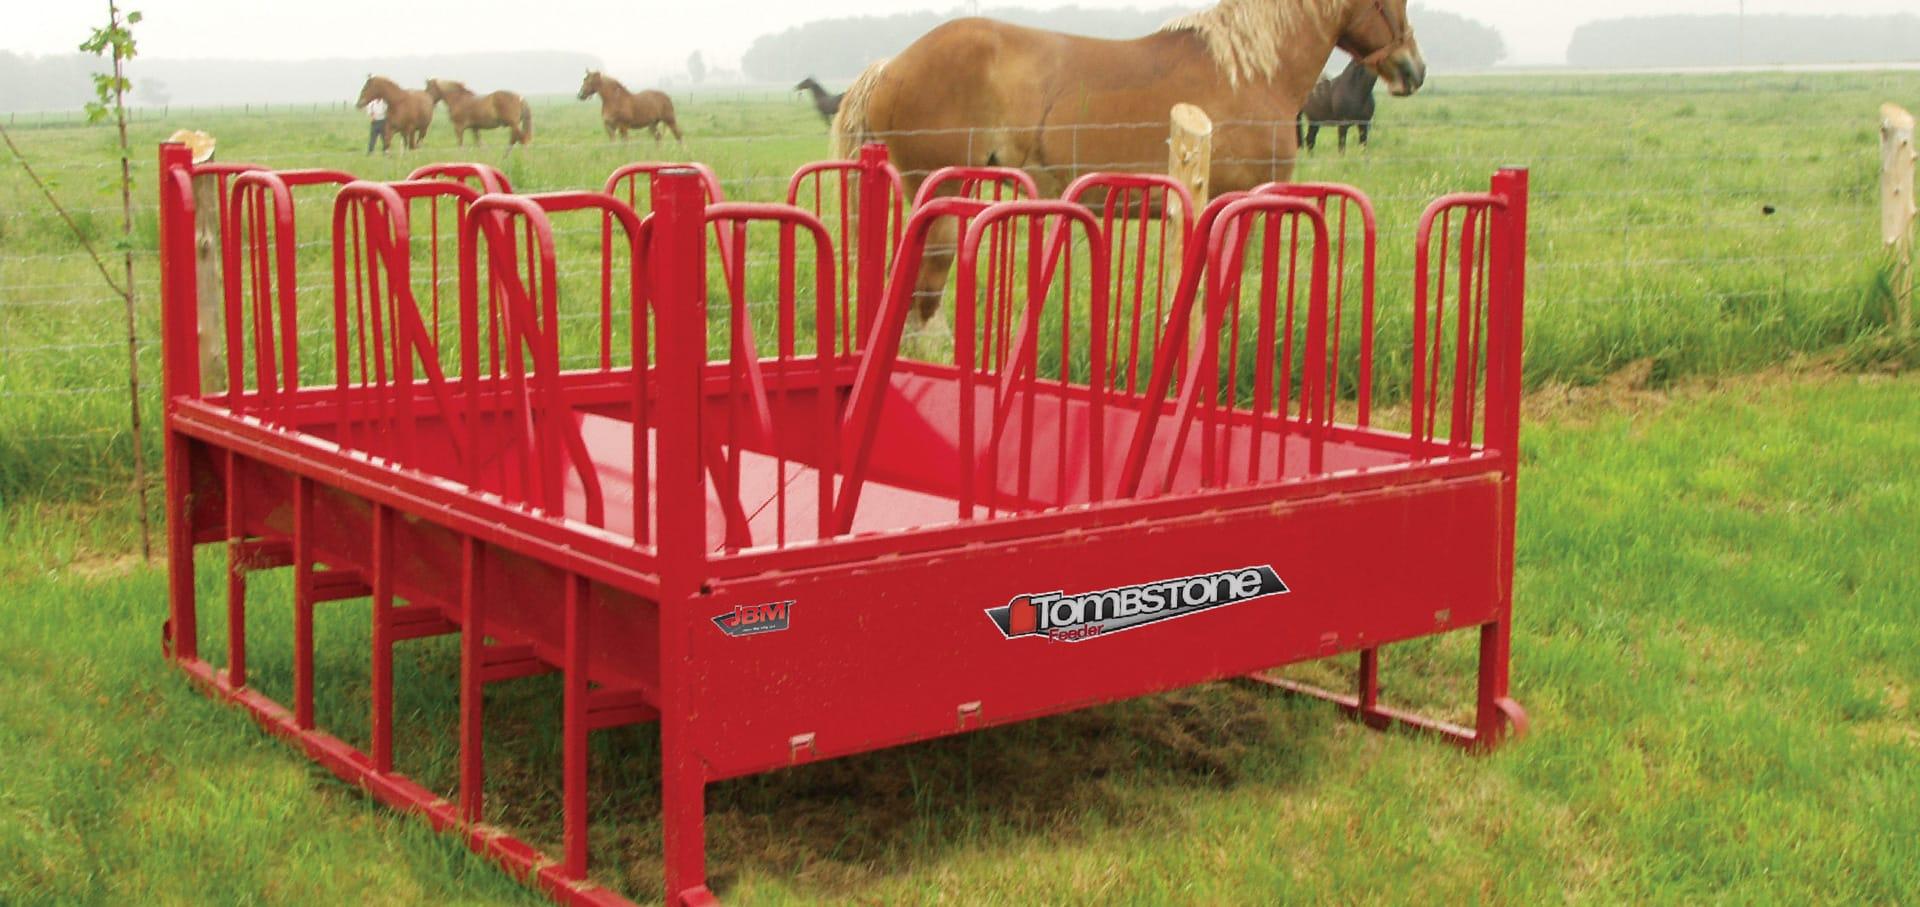 wagon inc apache viewinventory don equipment hay allison feeder asp new